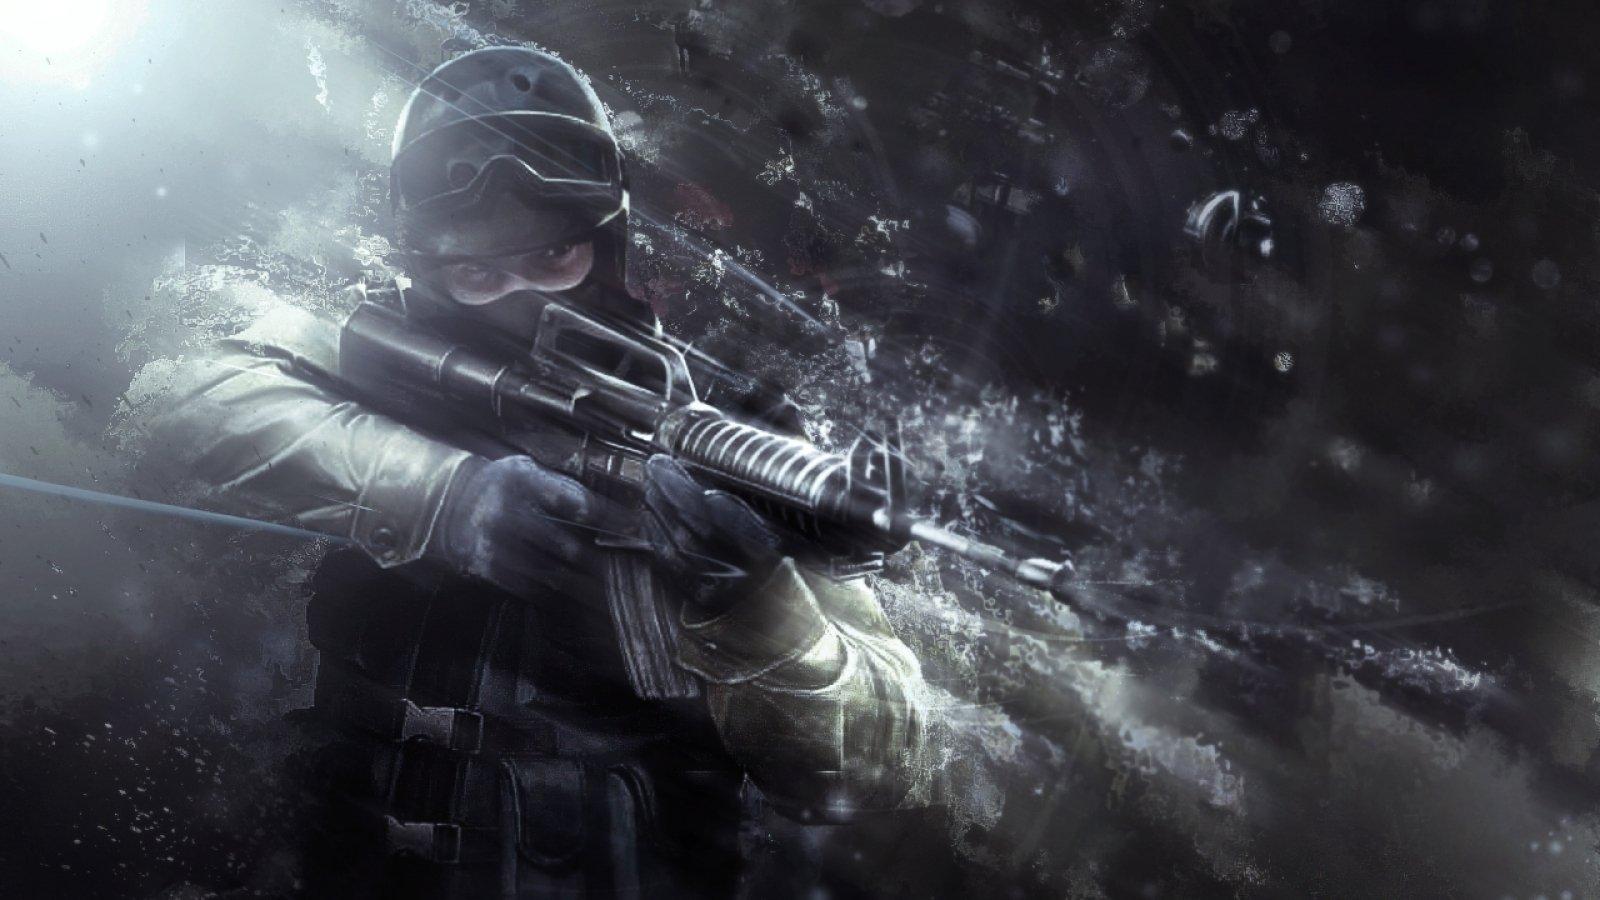 Counter Strike Wallpaper Sf Wallpaper